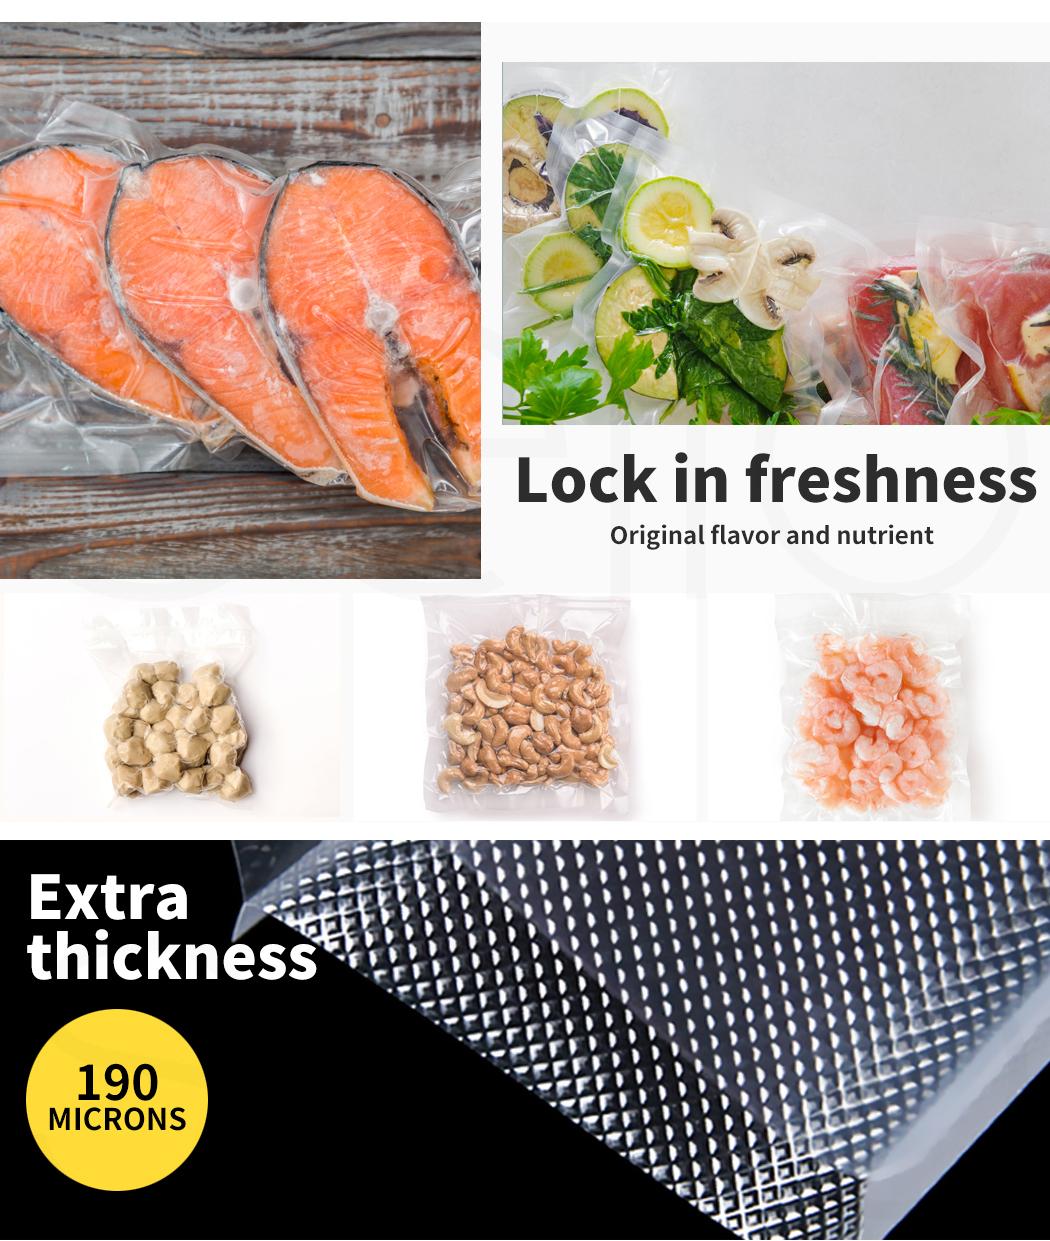 thumbnail 60 - Vacuum Food Sealer Storage Bags Saver Seal Bags Commercial Heat 100/200/500x